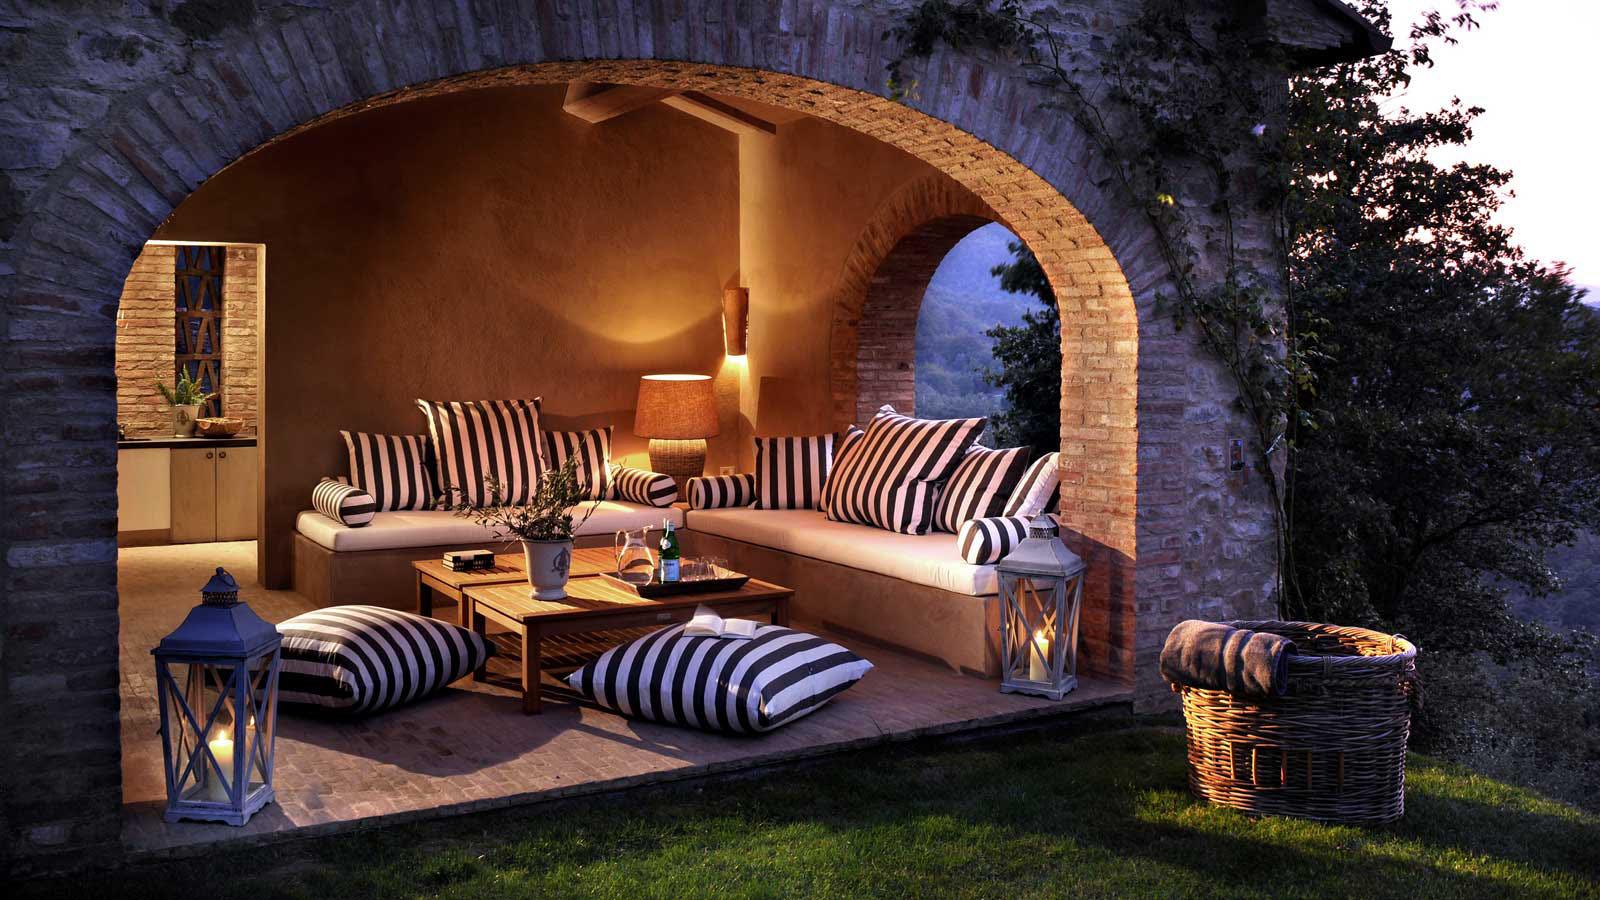 Spinaltermine castello di reschio 2 for Design hotel umbrien